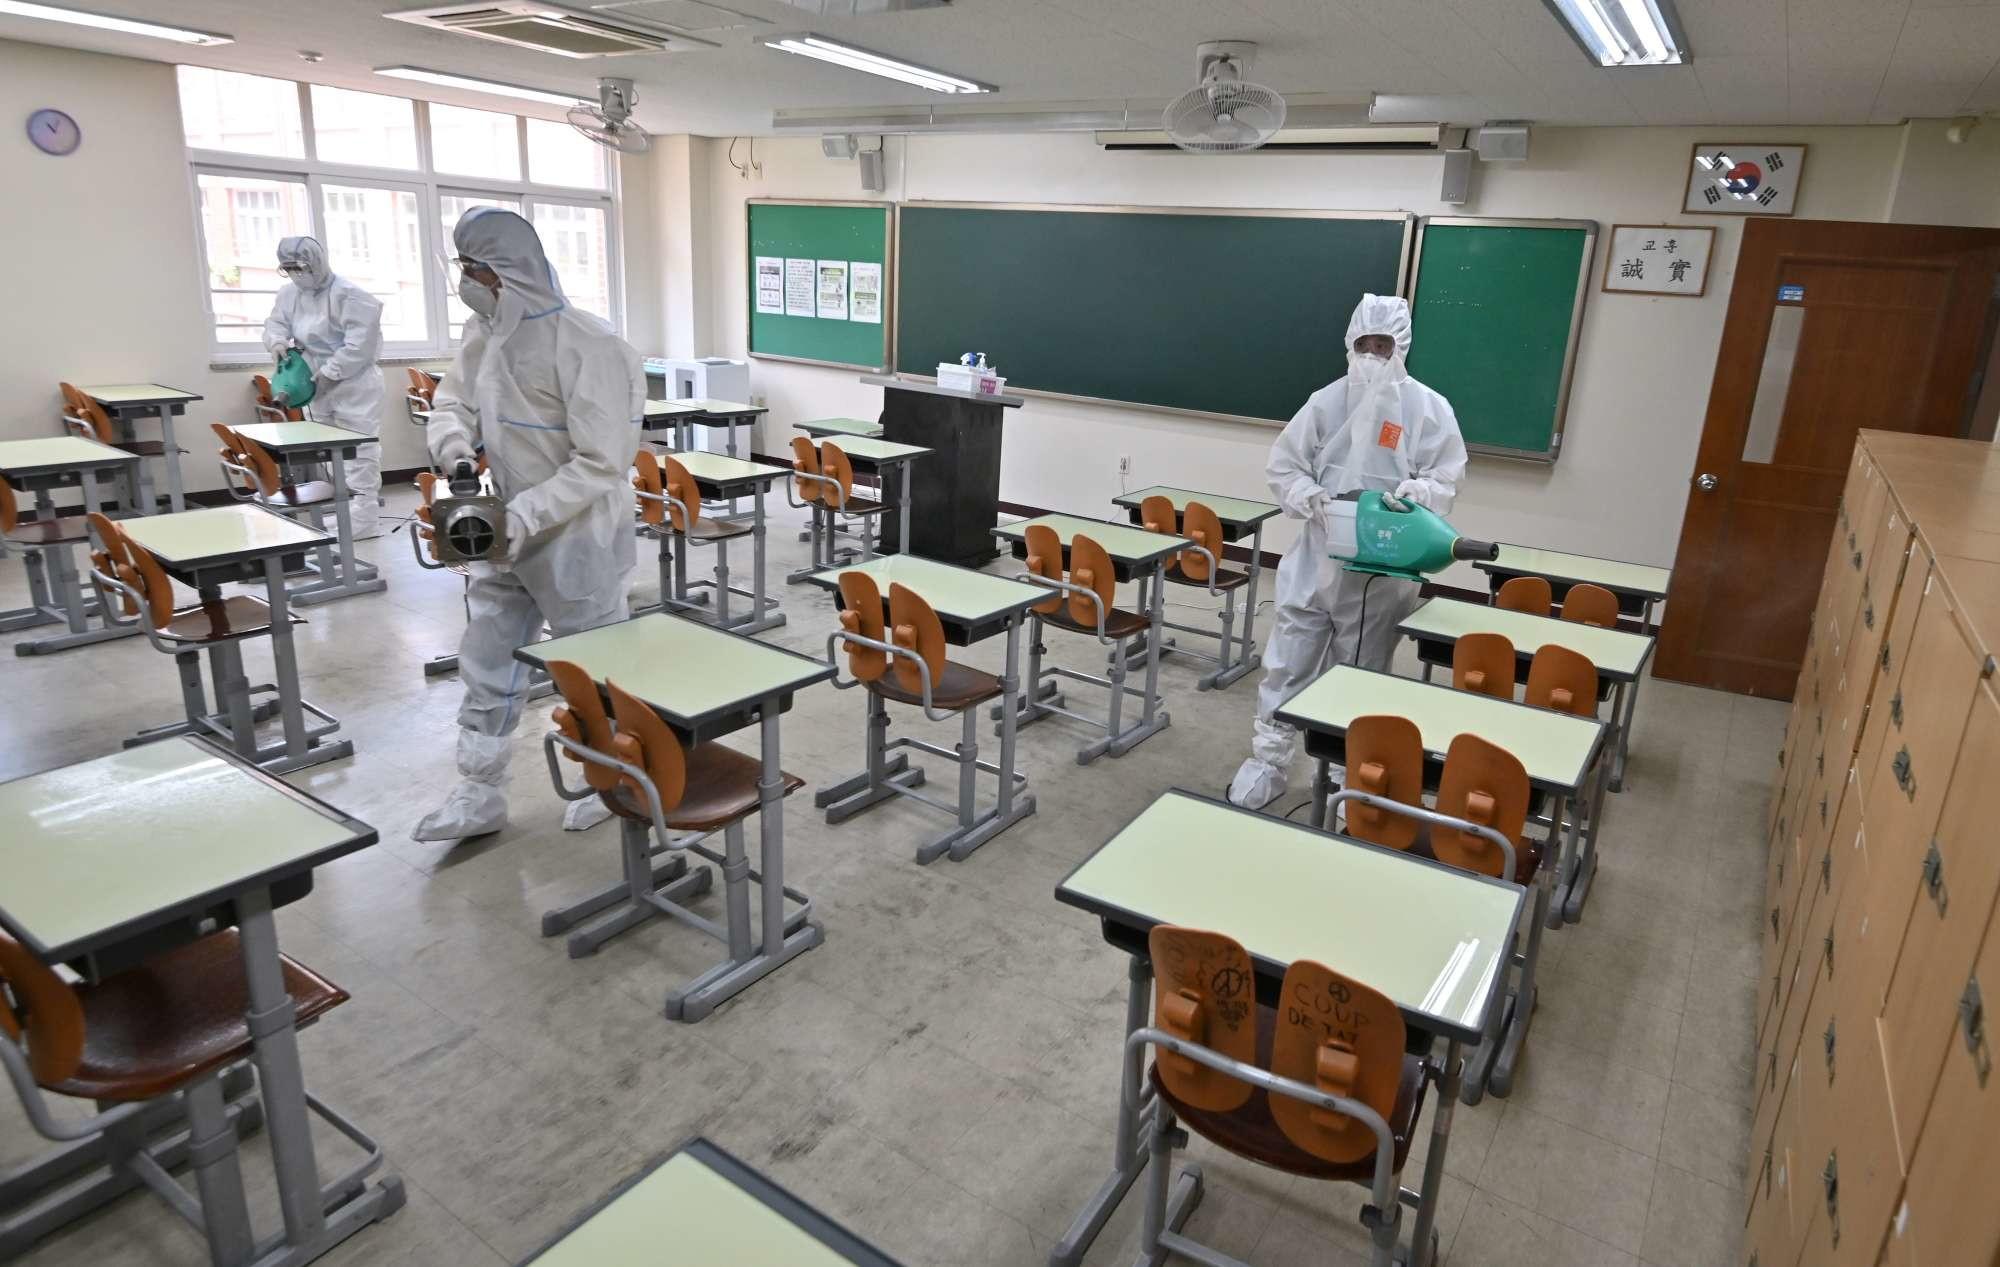 disinfecting-classroom